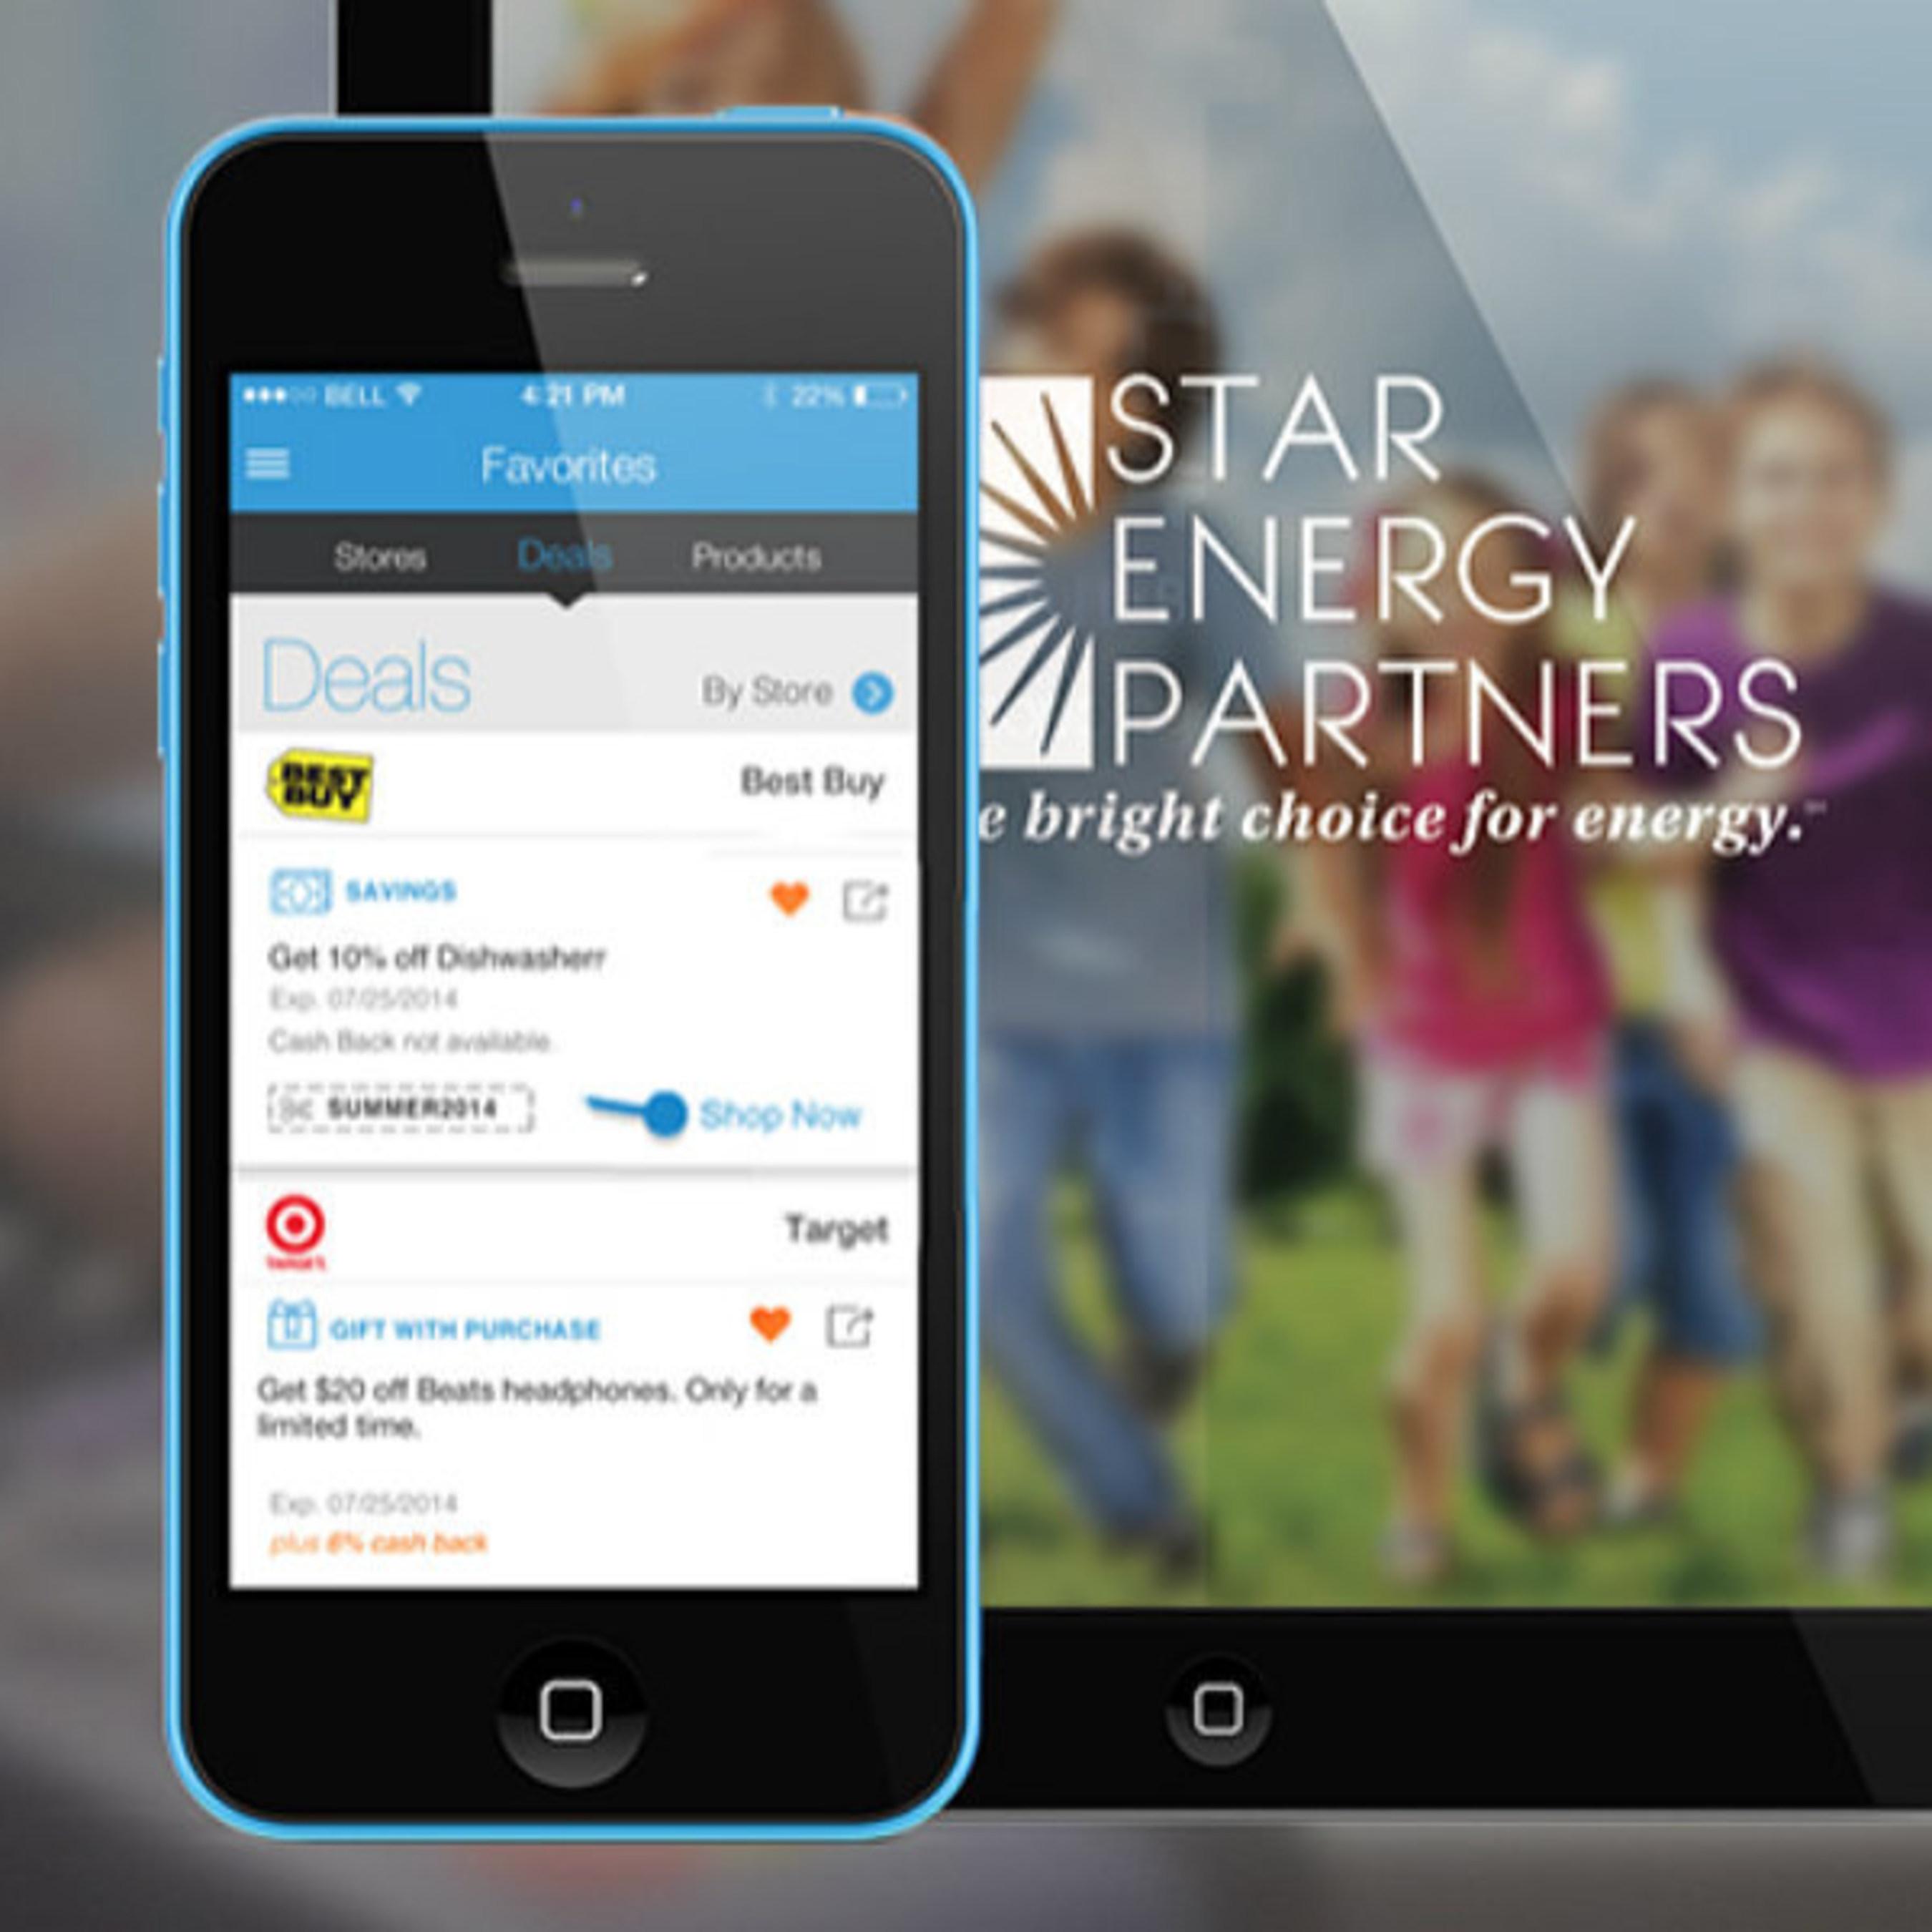 Star Energy Partners Introduces Customer Rewards Program